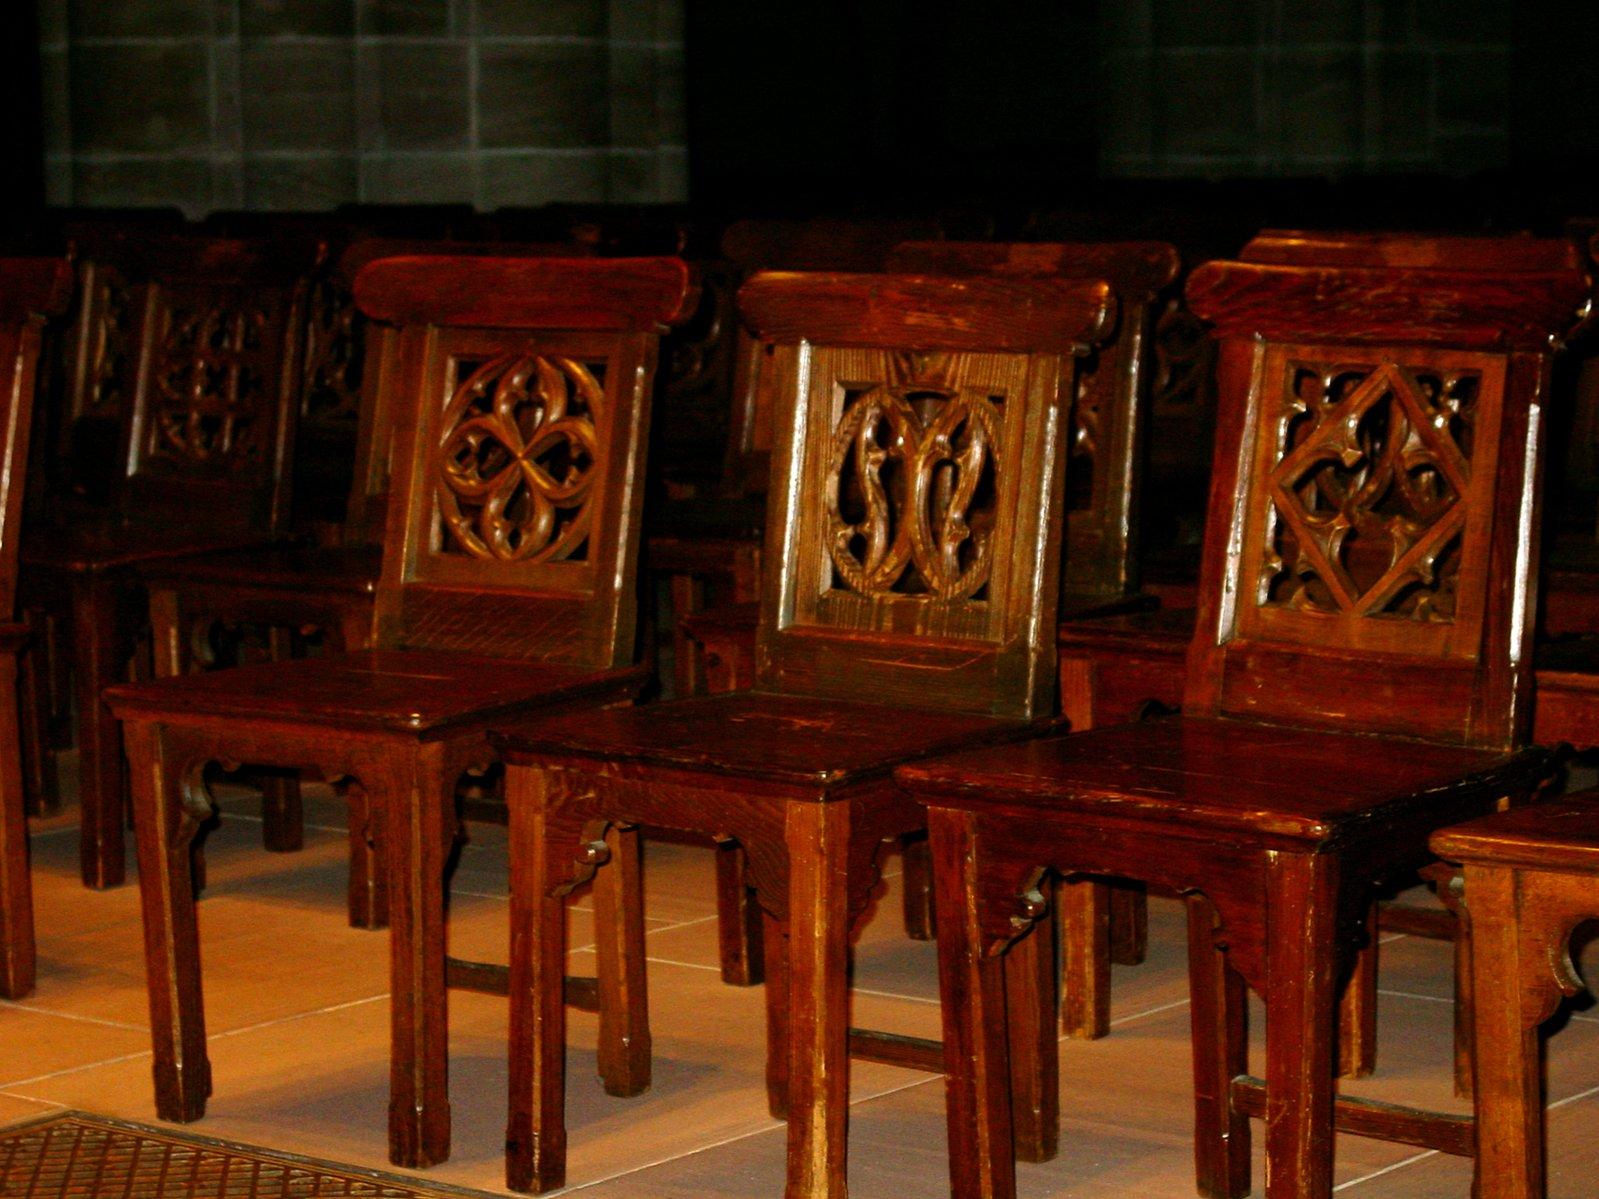 Church chairs in white chairs church sanctuary chairs for Wohndesign chur